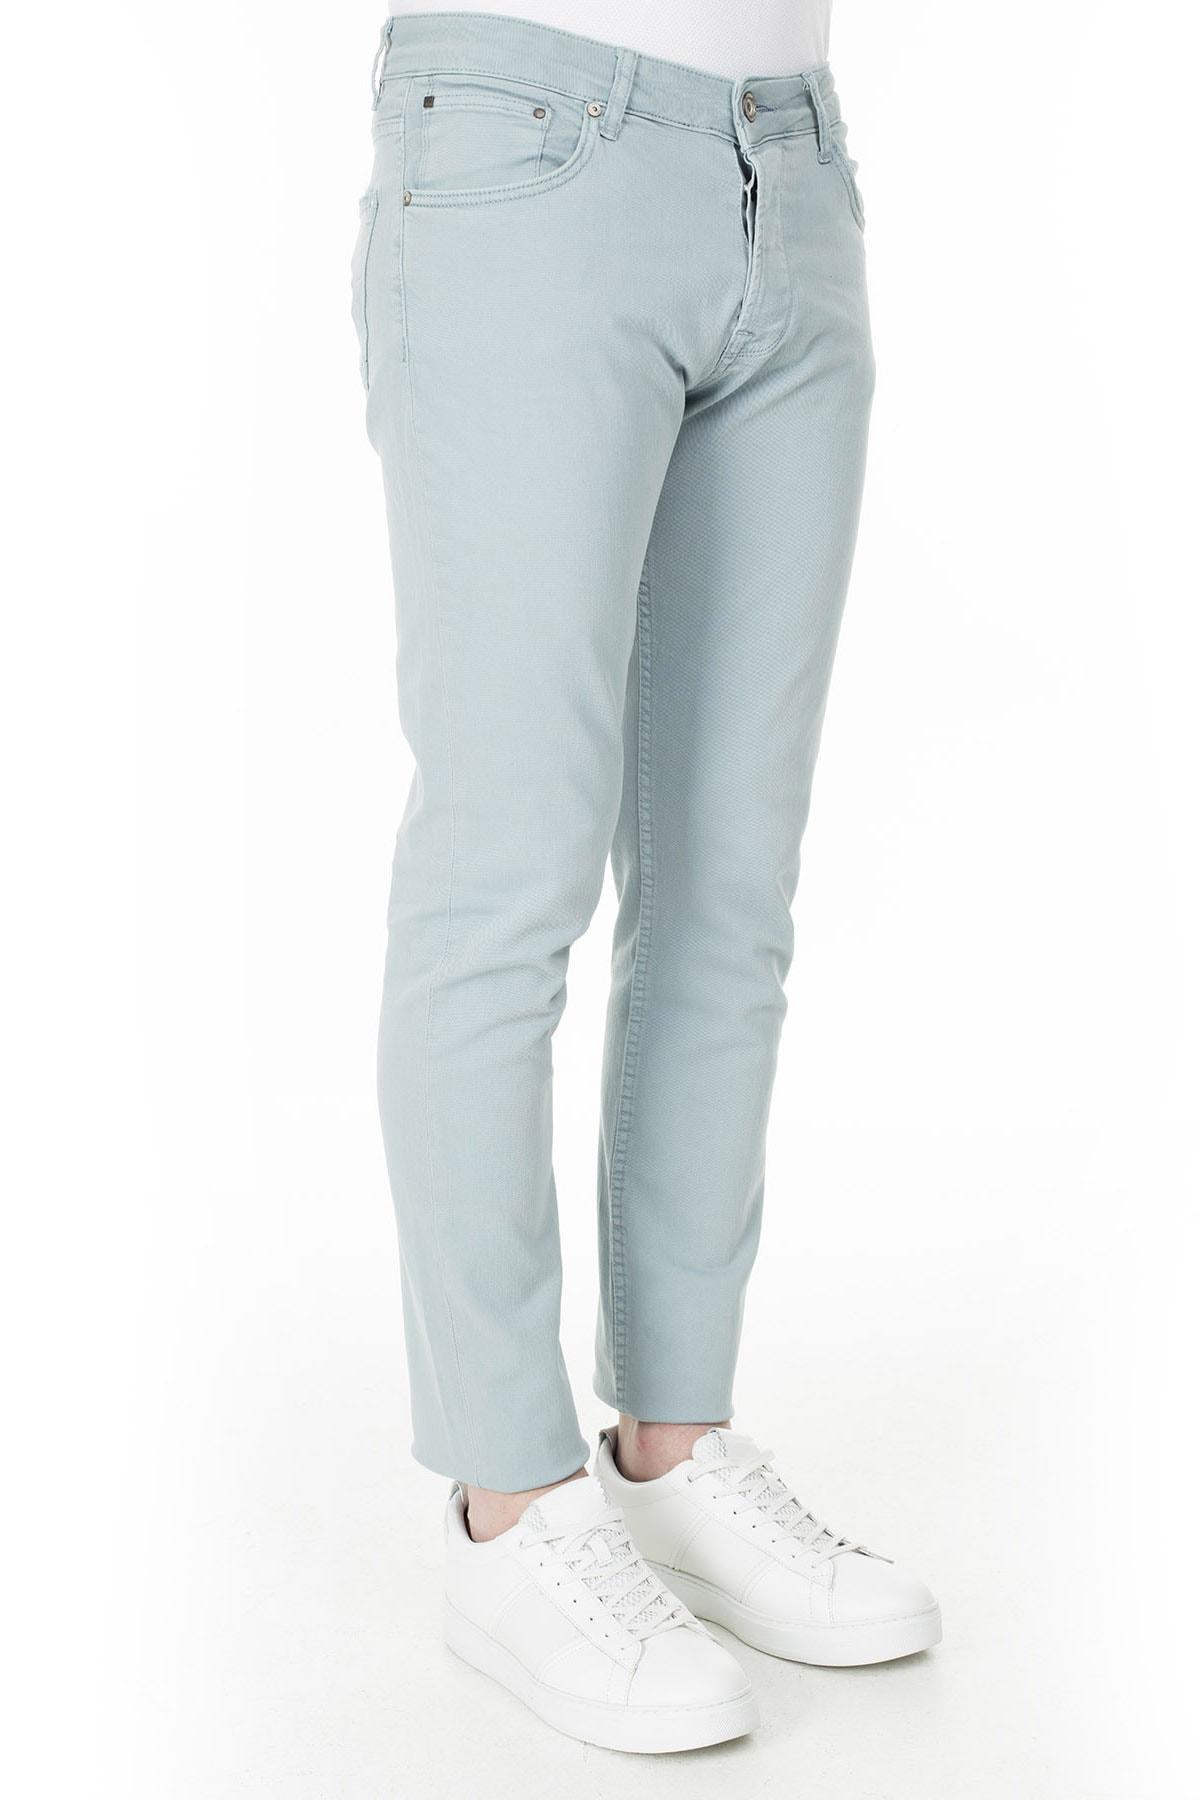 Buratti Erkek AÇIK MAVİ Normal Bel Dar Paça Slim Fit Jeans Pamuklu Kot Pantolon 7299F0287ARTOS 1